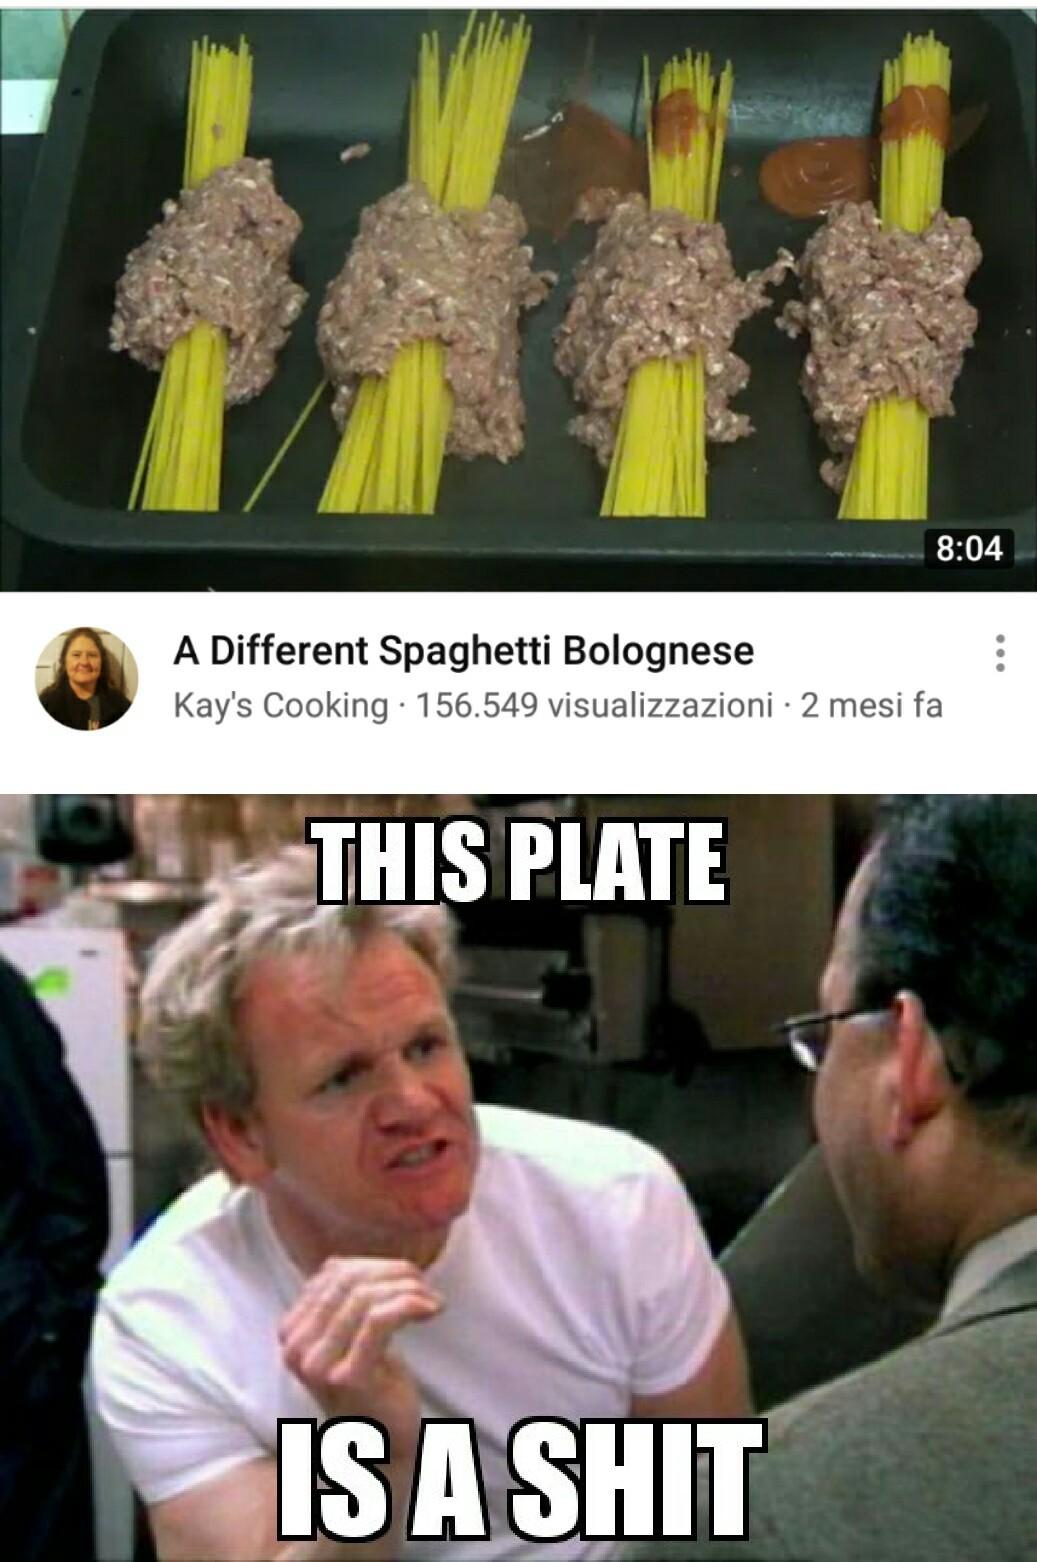 A different spaghetti bolognese... - meme